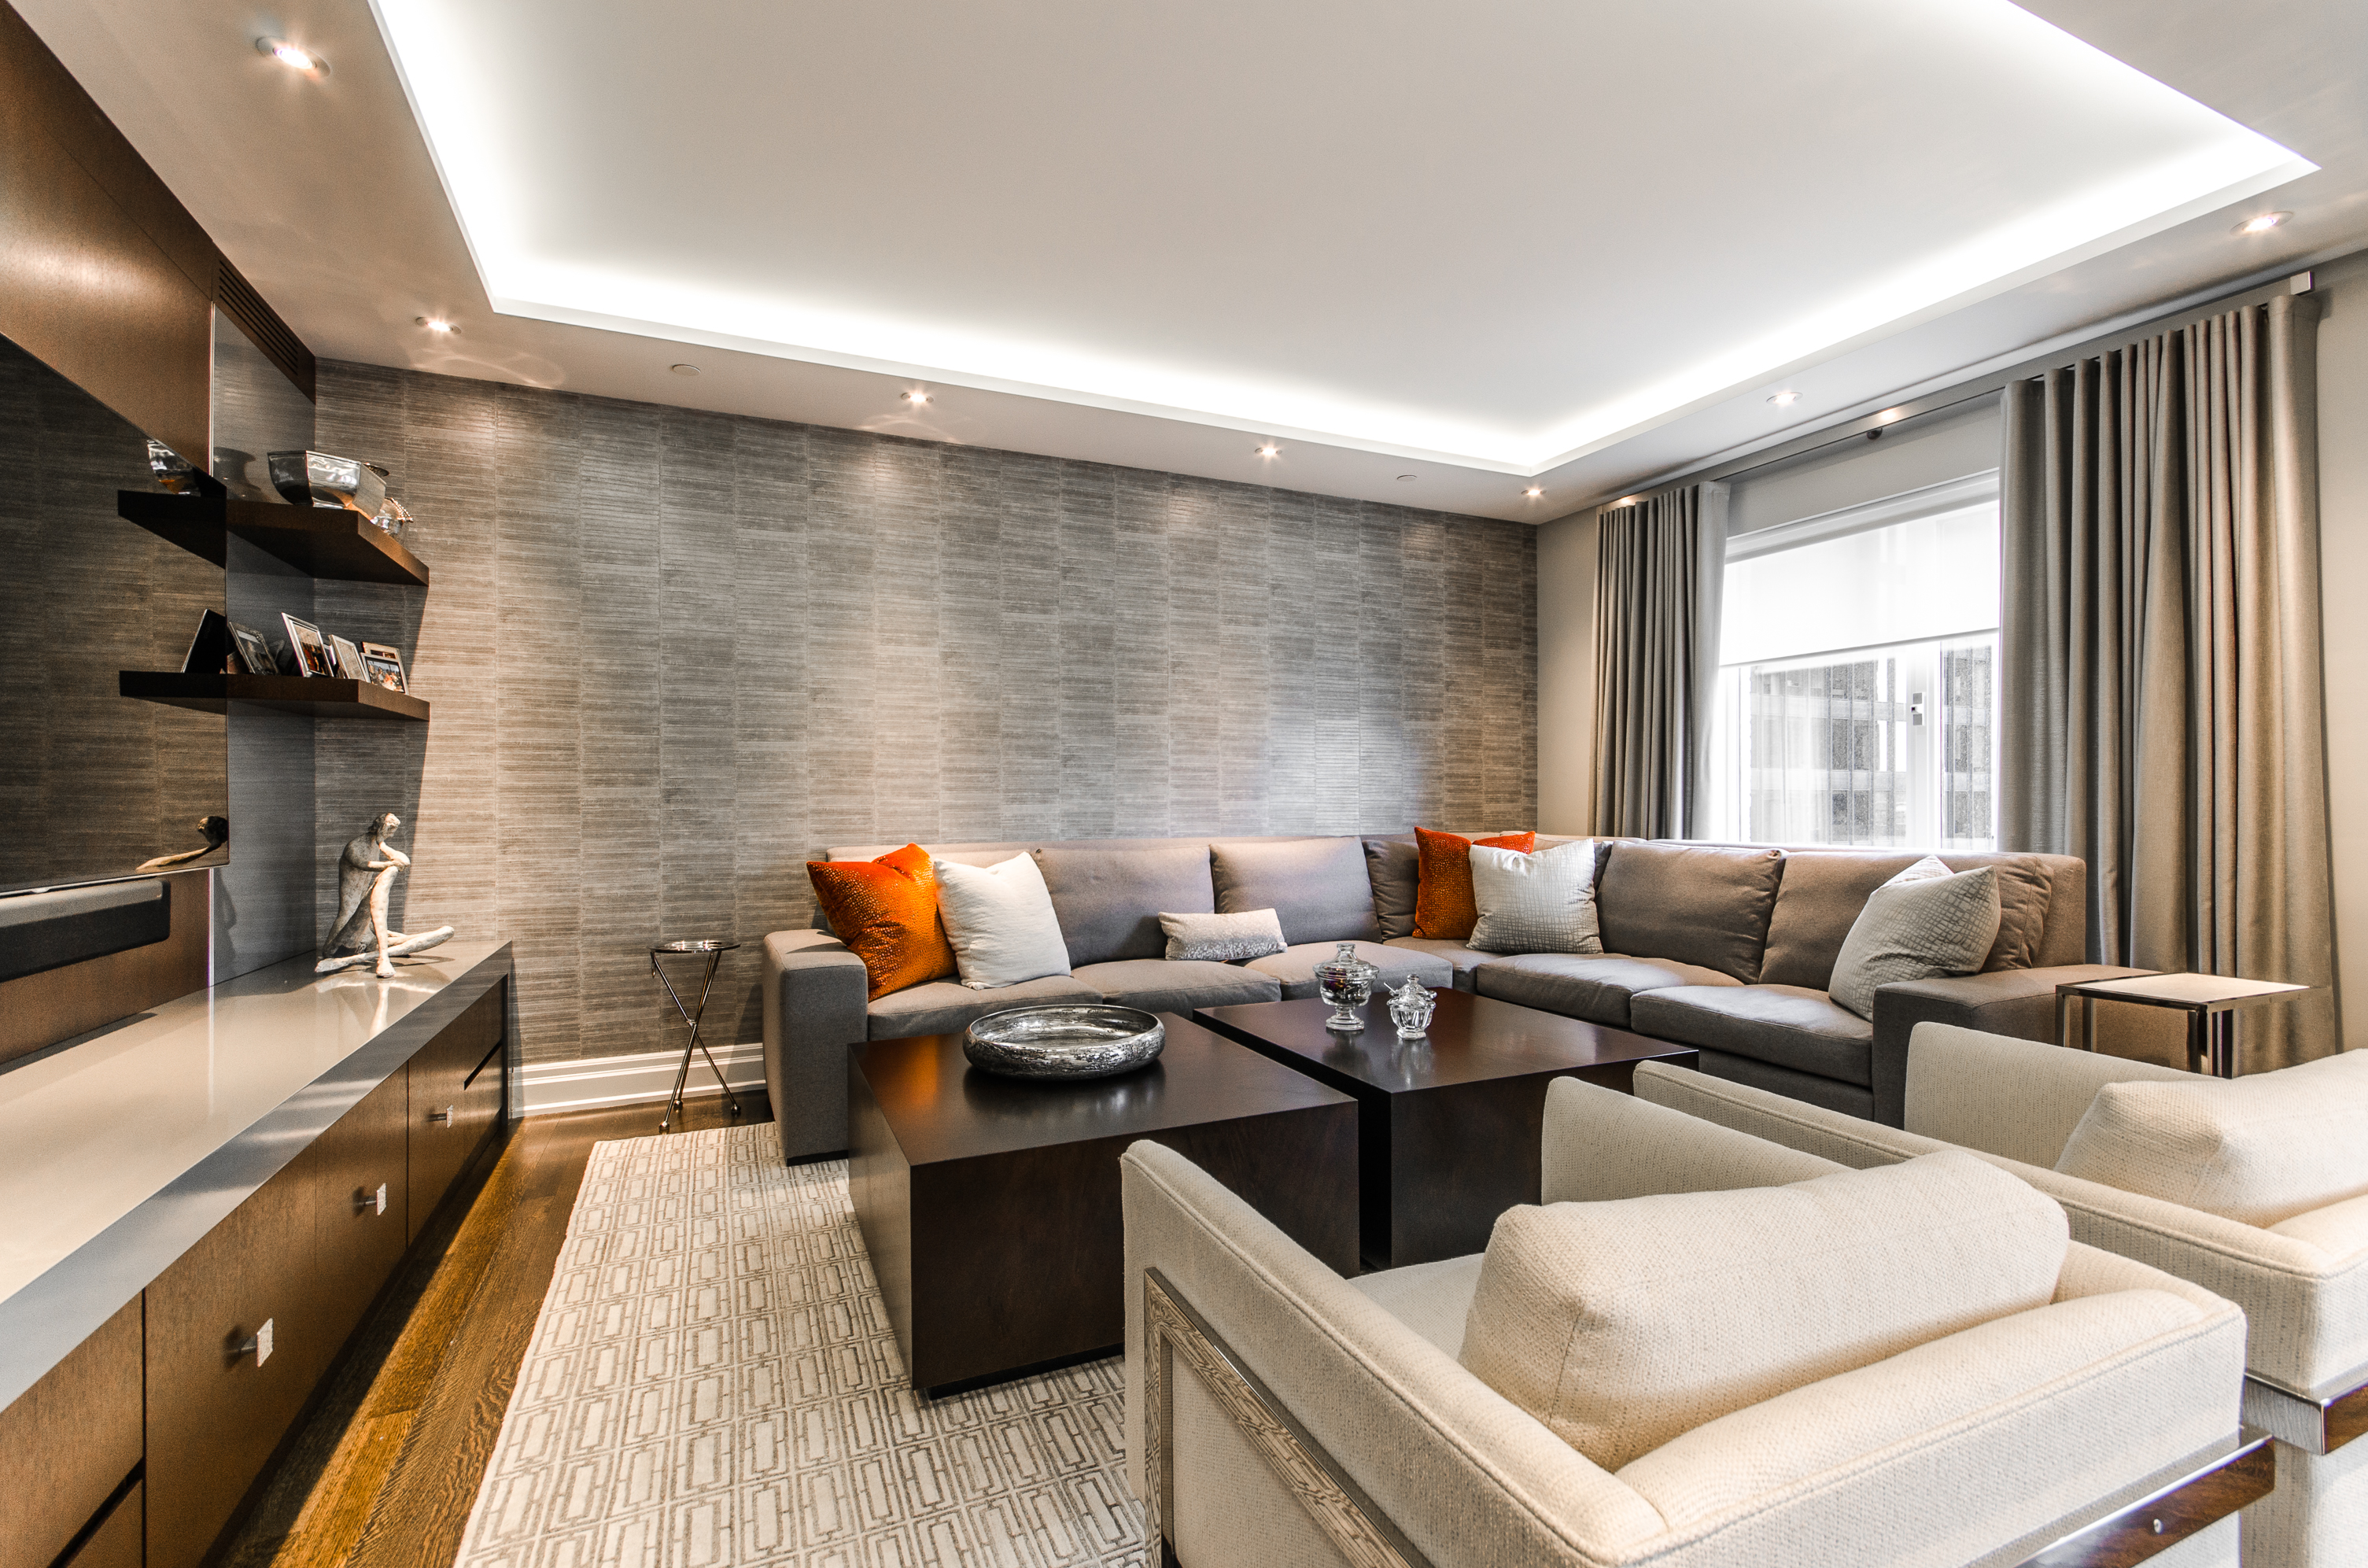 Modern Contemporary Interior Design renee gordon interior design, interior decor portfolio